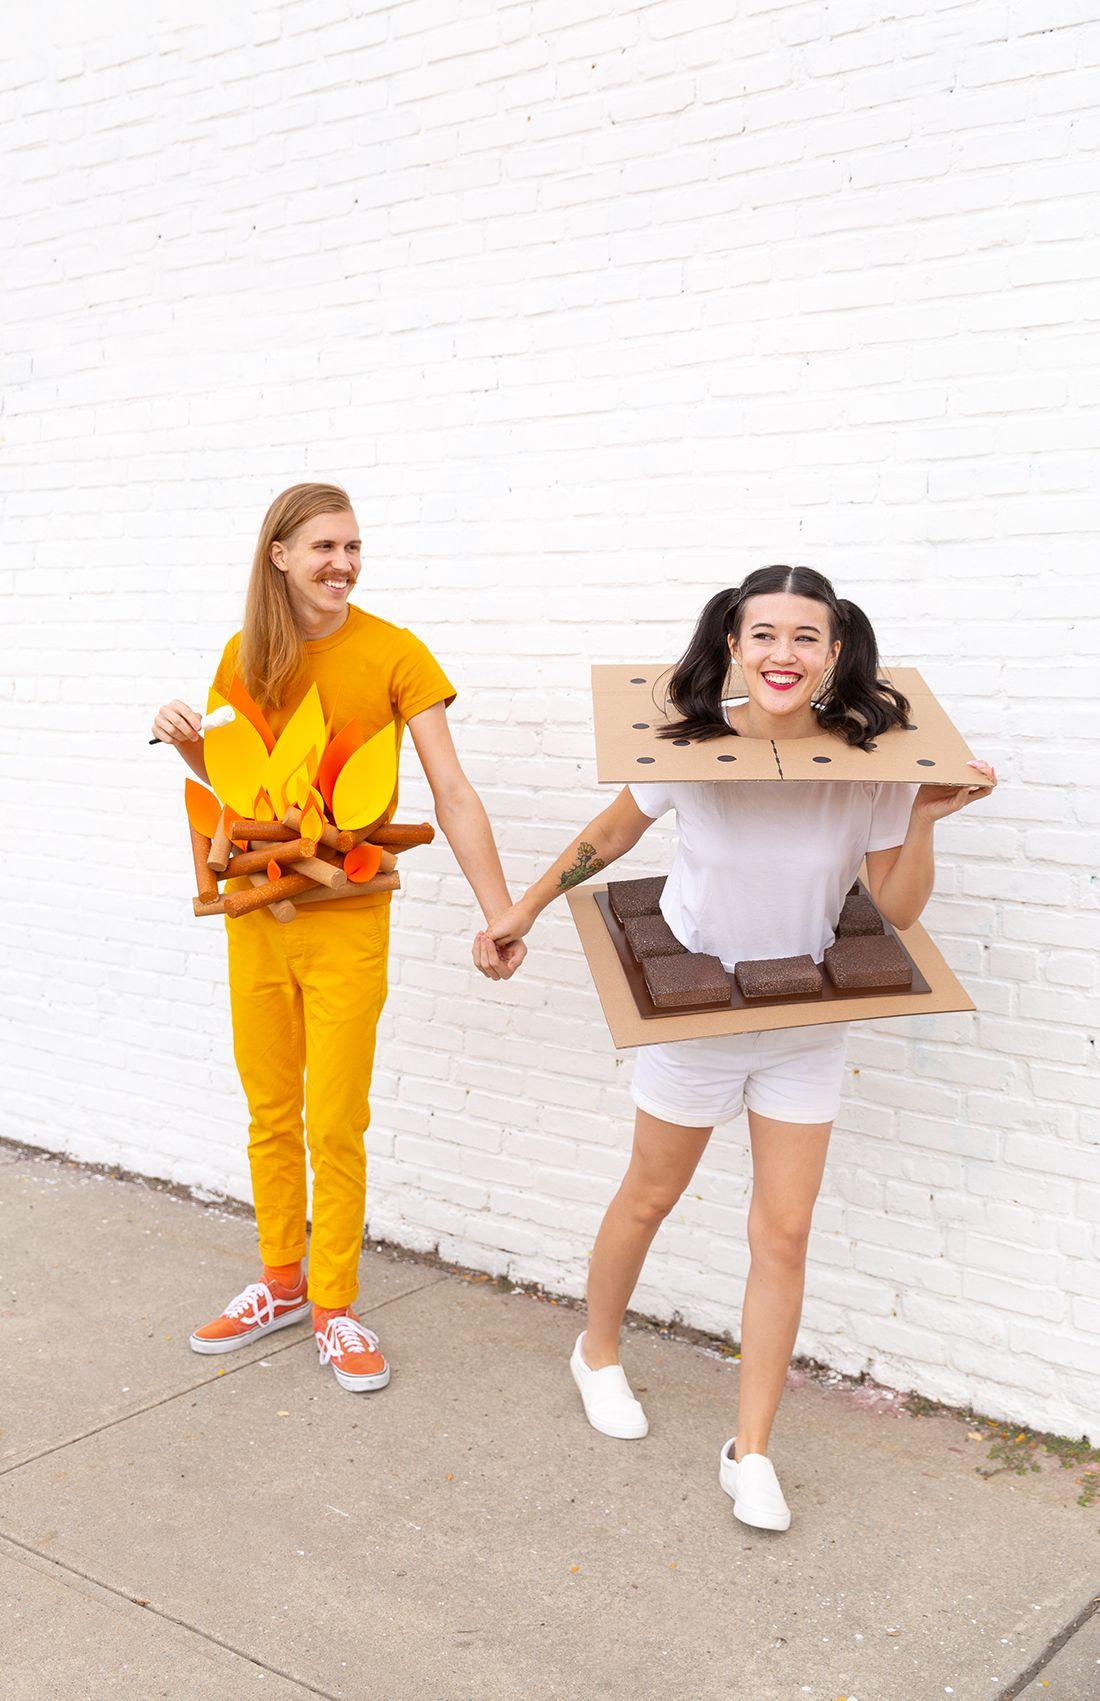 Halloween Costumes For Two Women.42 Best Friend Halloween Costumes 2021 Diy Bff Duo Costume Ideas